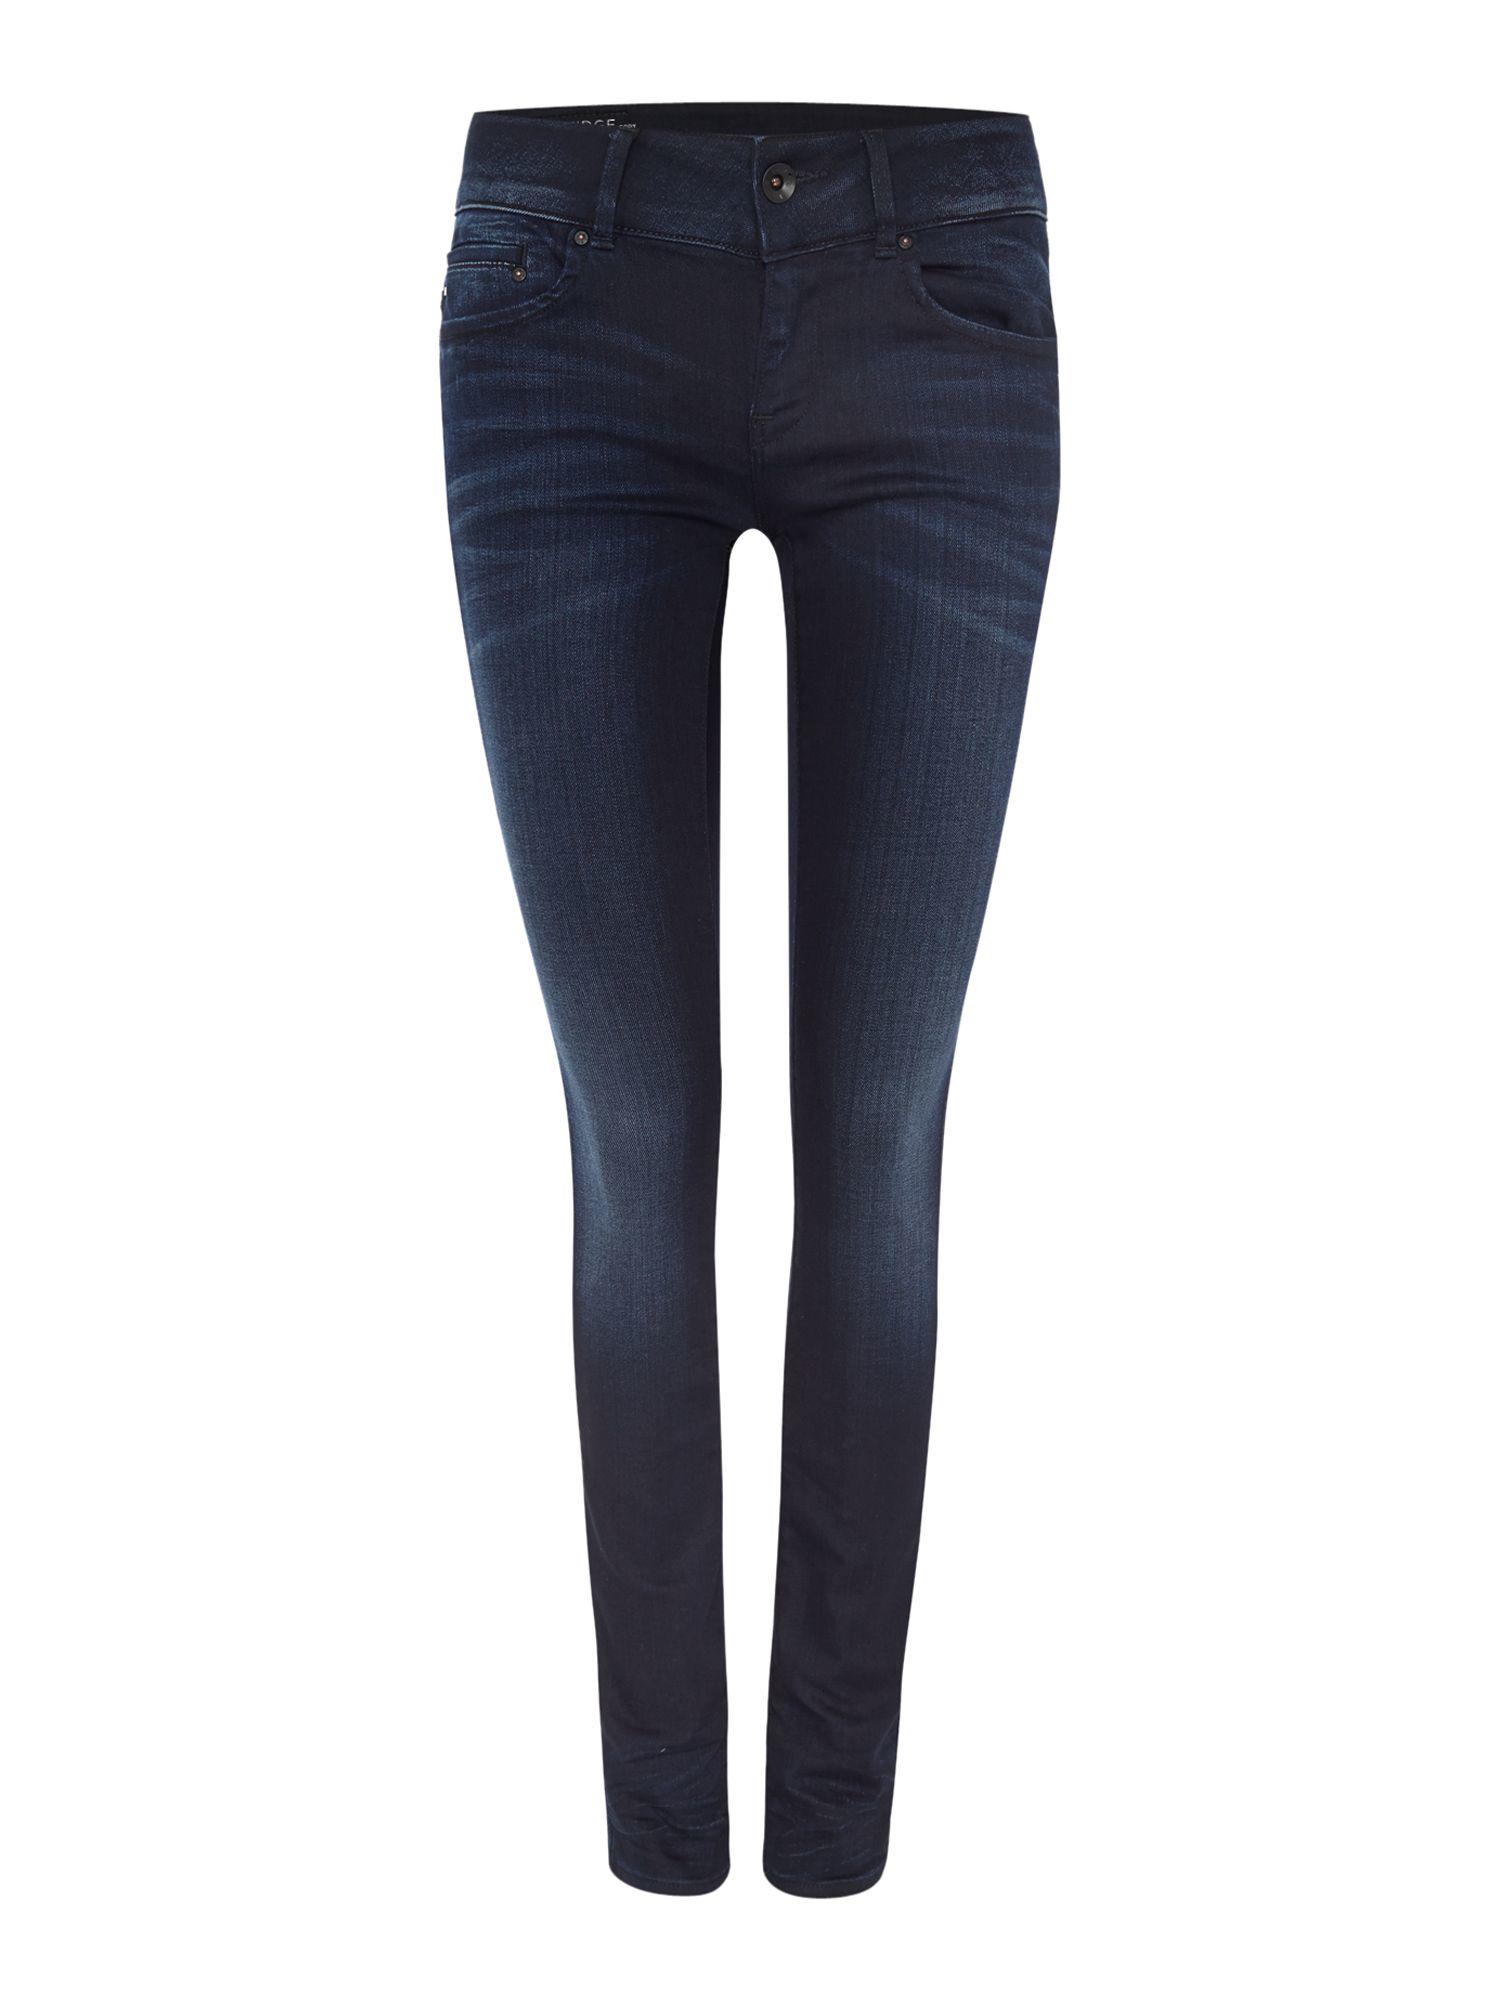 star raw midge cody mid rise skinny jean in slander navy in blue. Black Bedroom Furniture Sets. Home Design Ideas